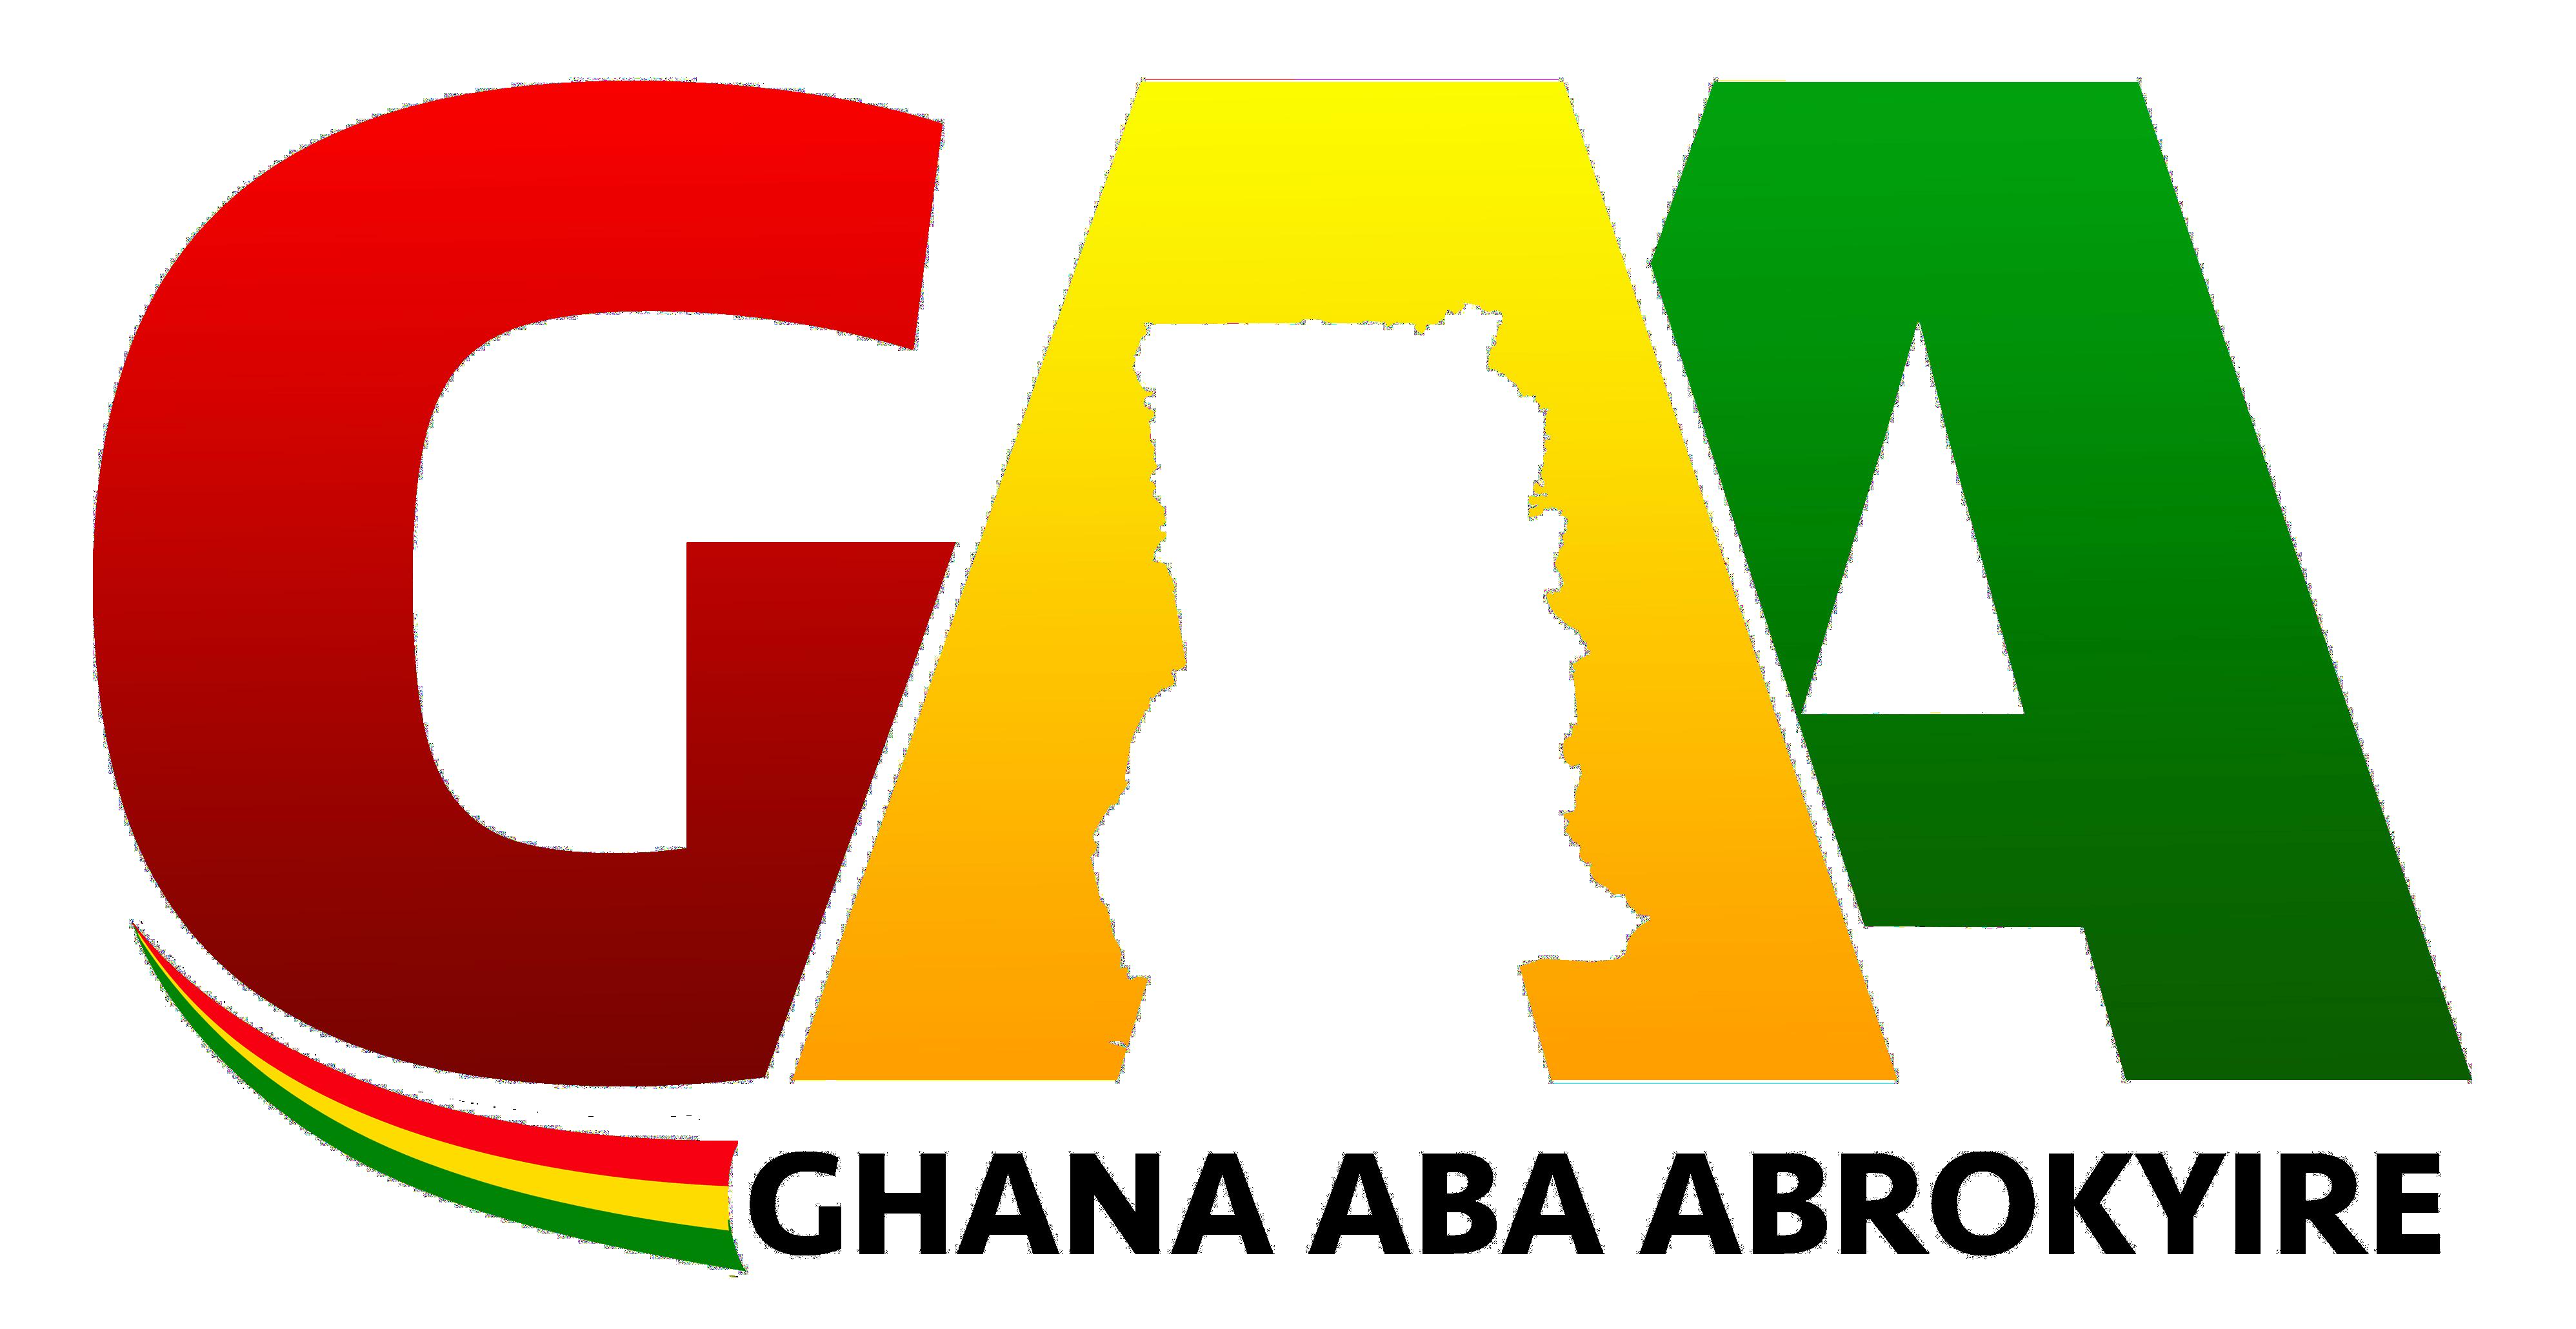 GHANA ABA ABROKYIRE Logo